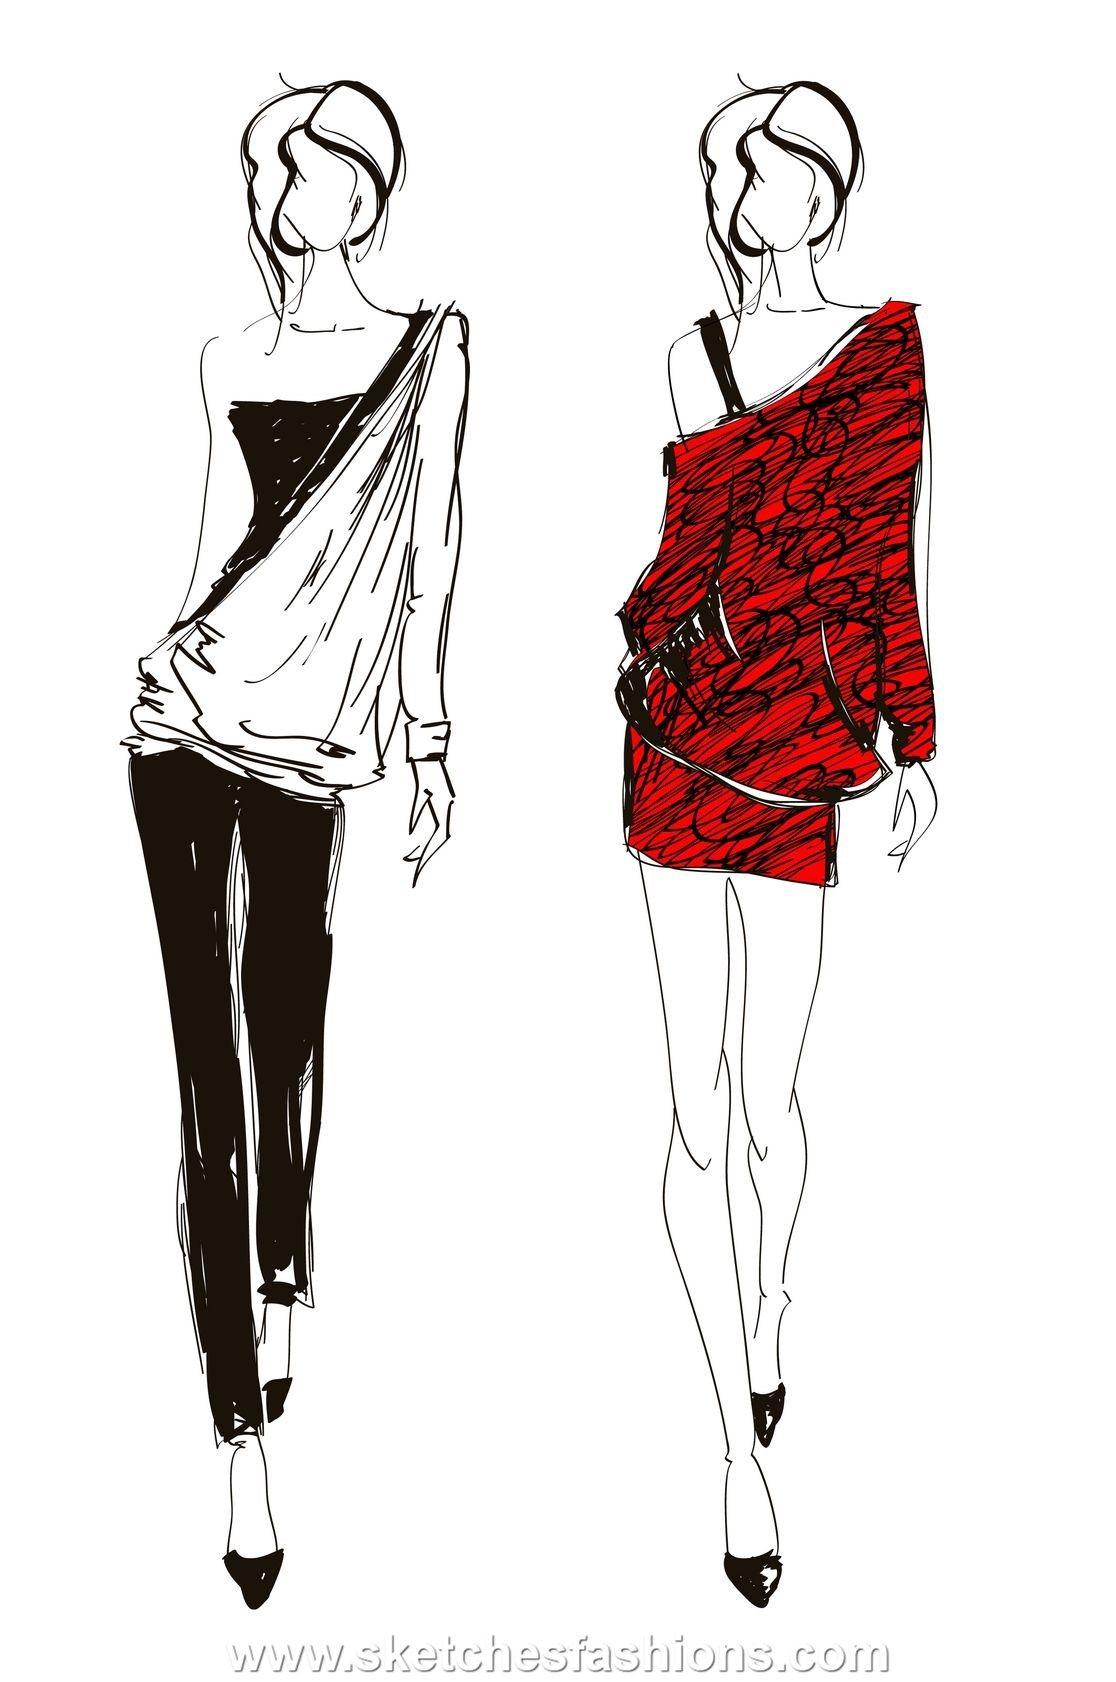 Tight Pants And Mini Skirts Fashion Sketch Fashion Sketches Fashion Design Sketches Fashion Figures